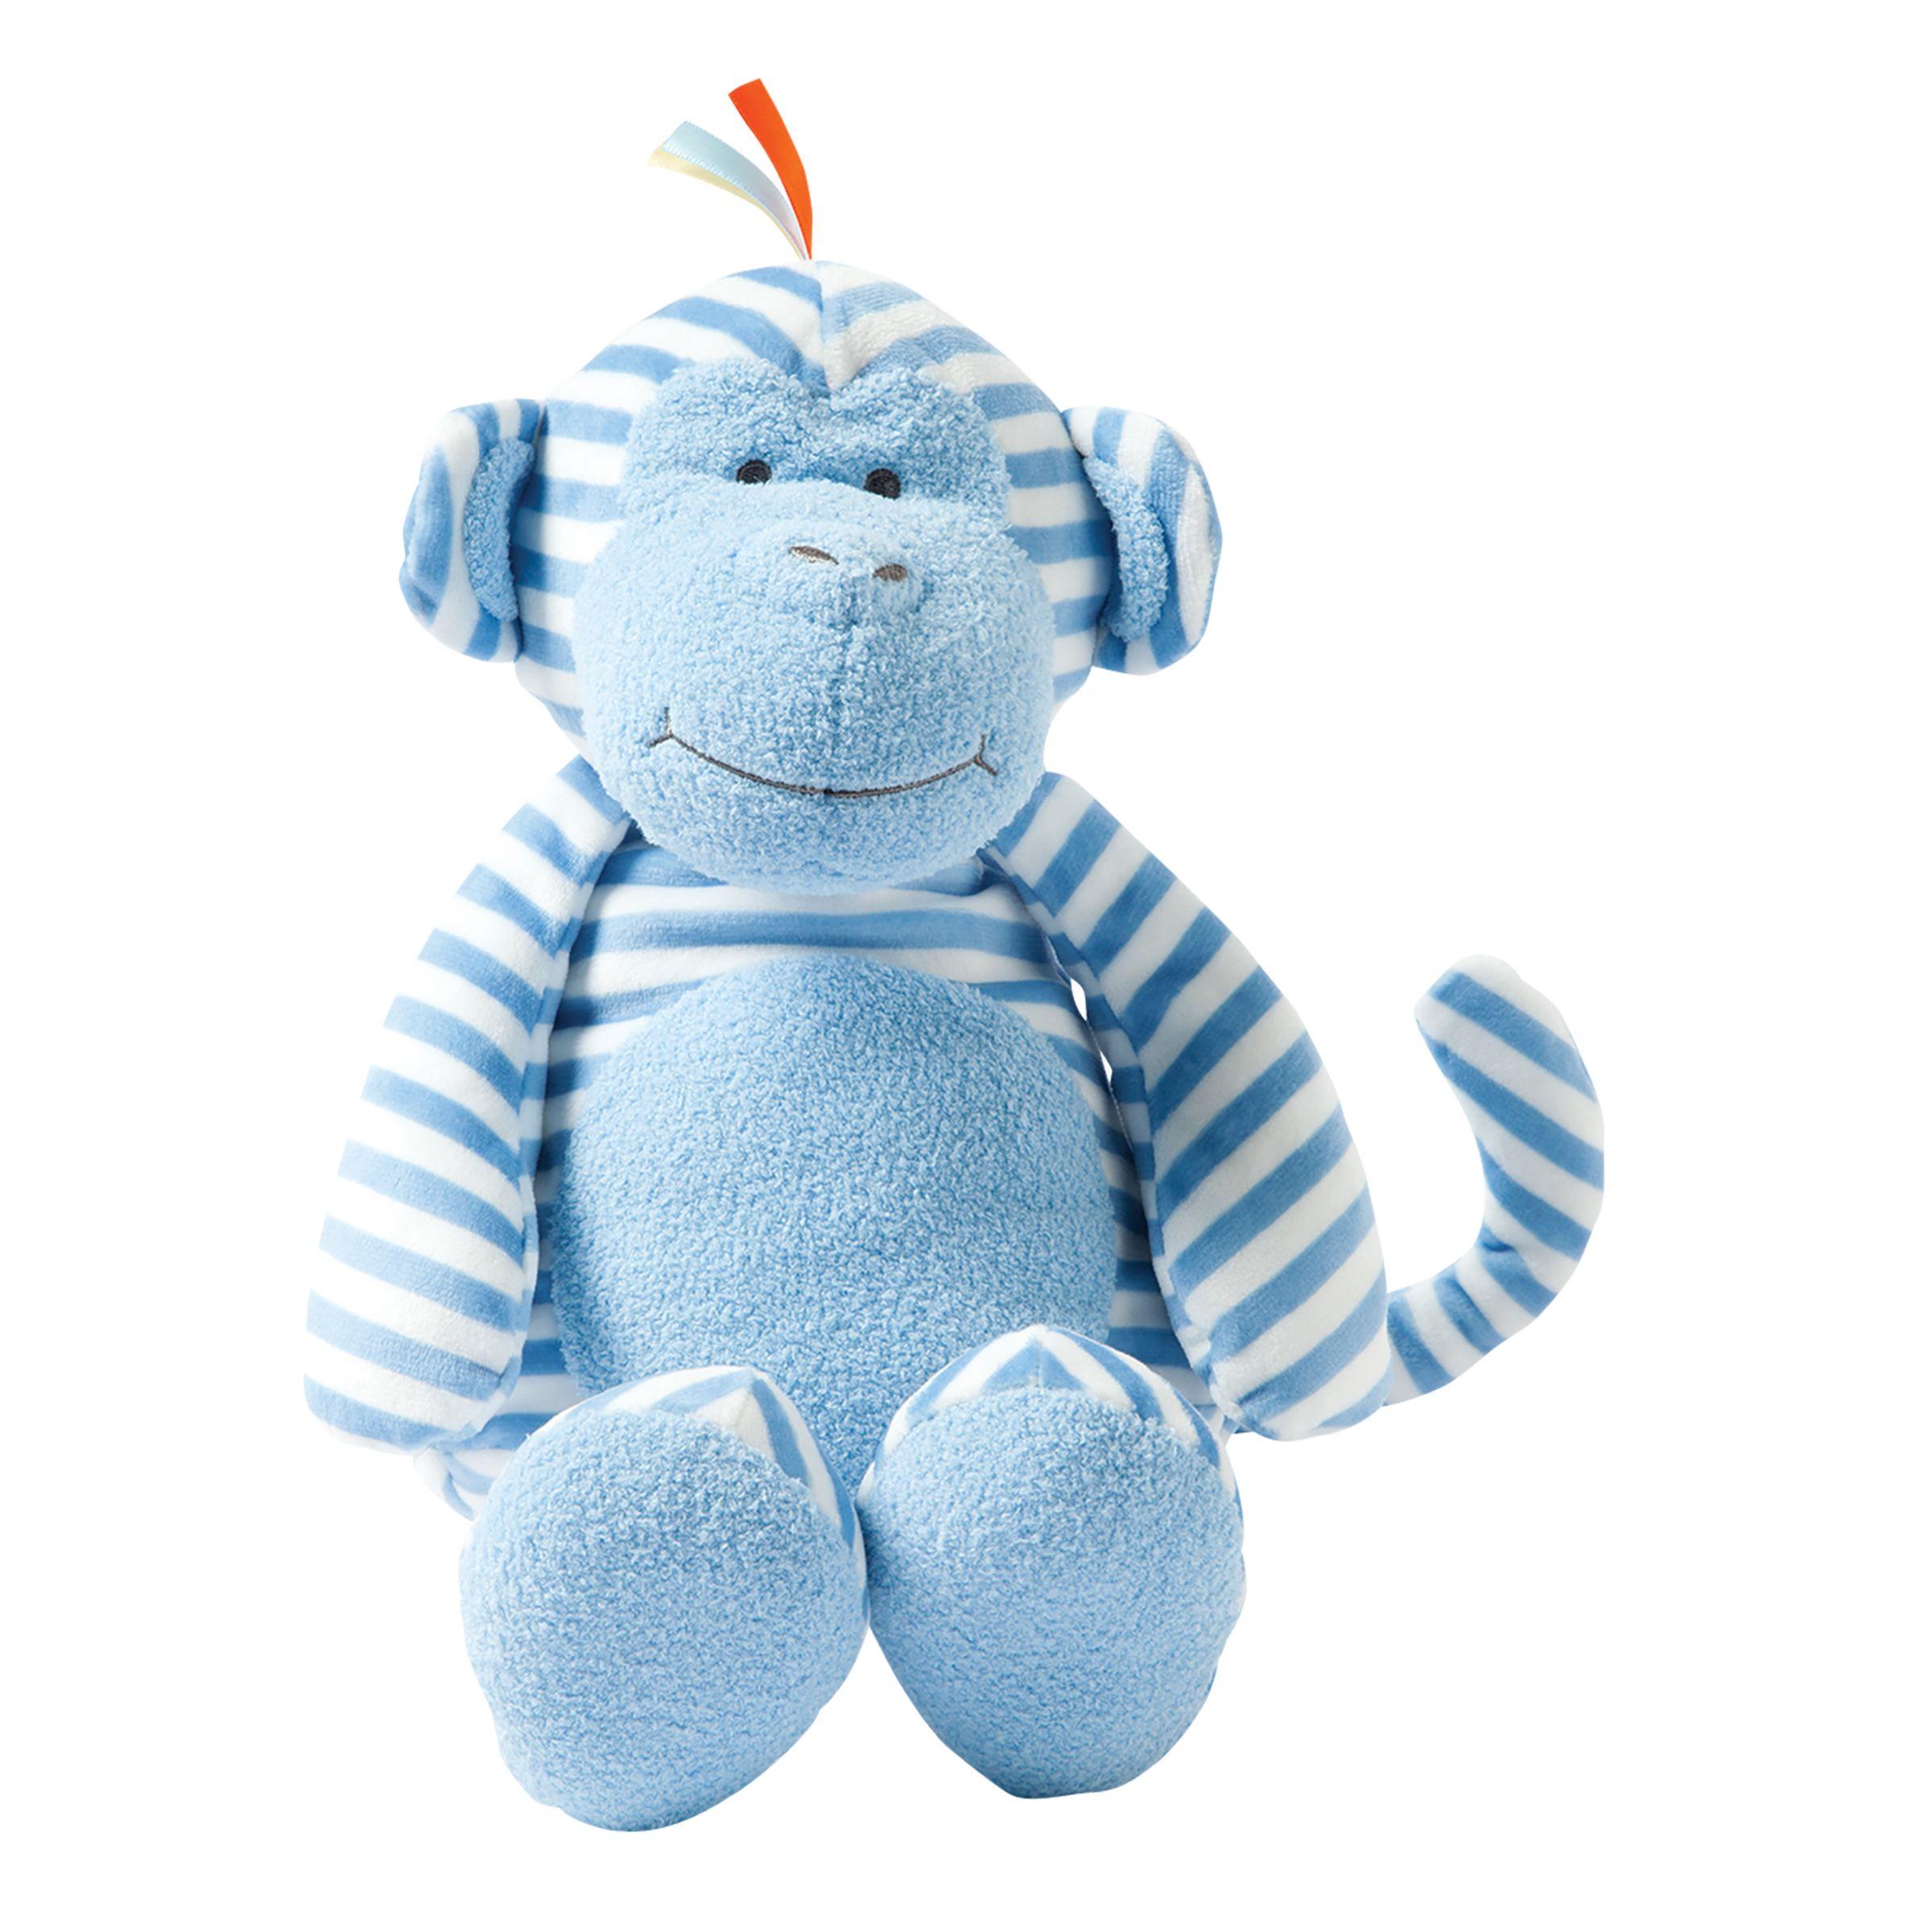 Manhattan Toy Manhattan Toy Giggle Monkey Soft Toy, Large